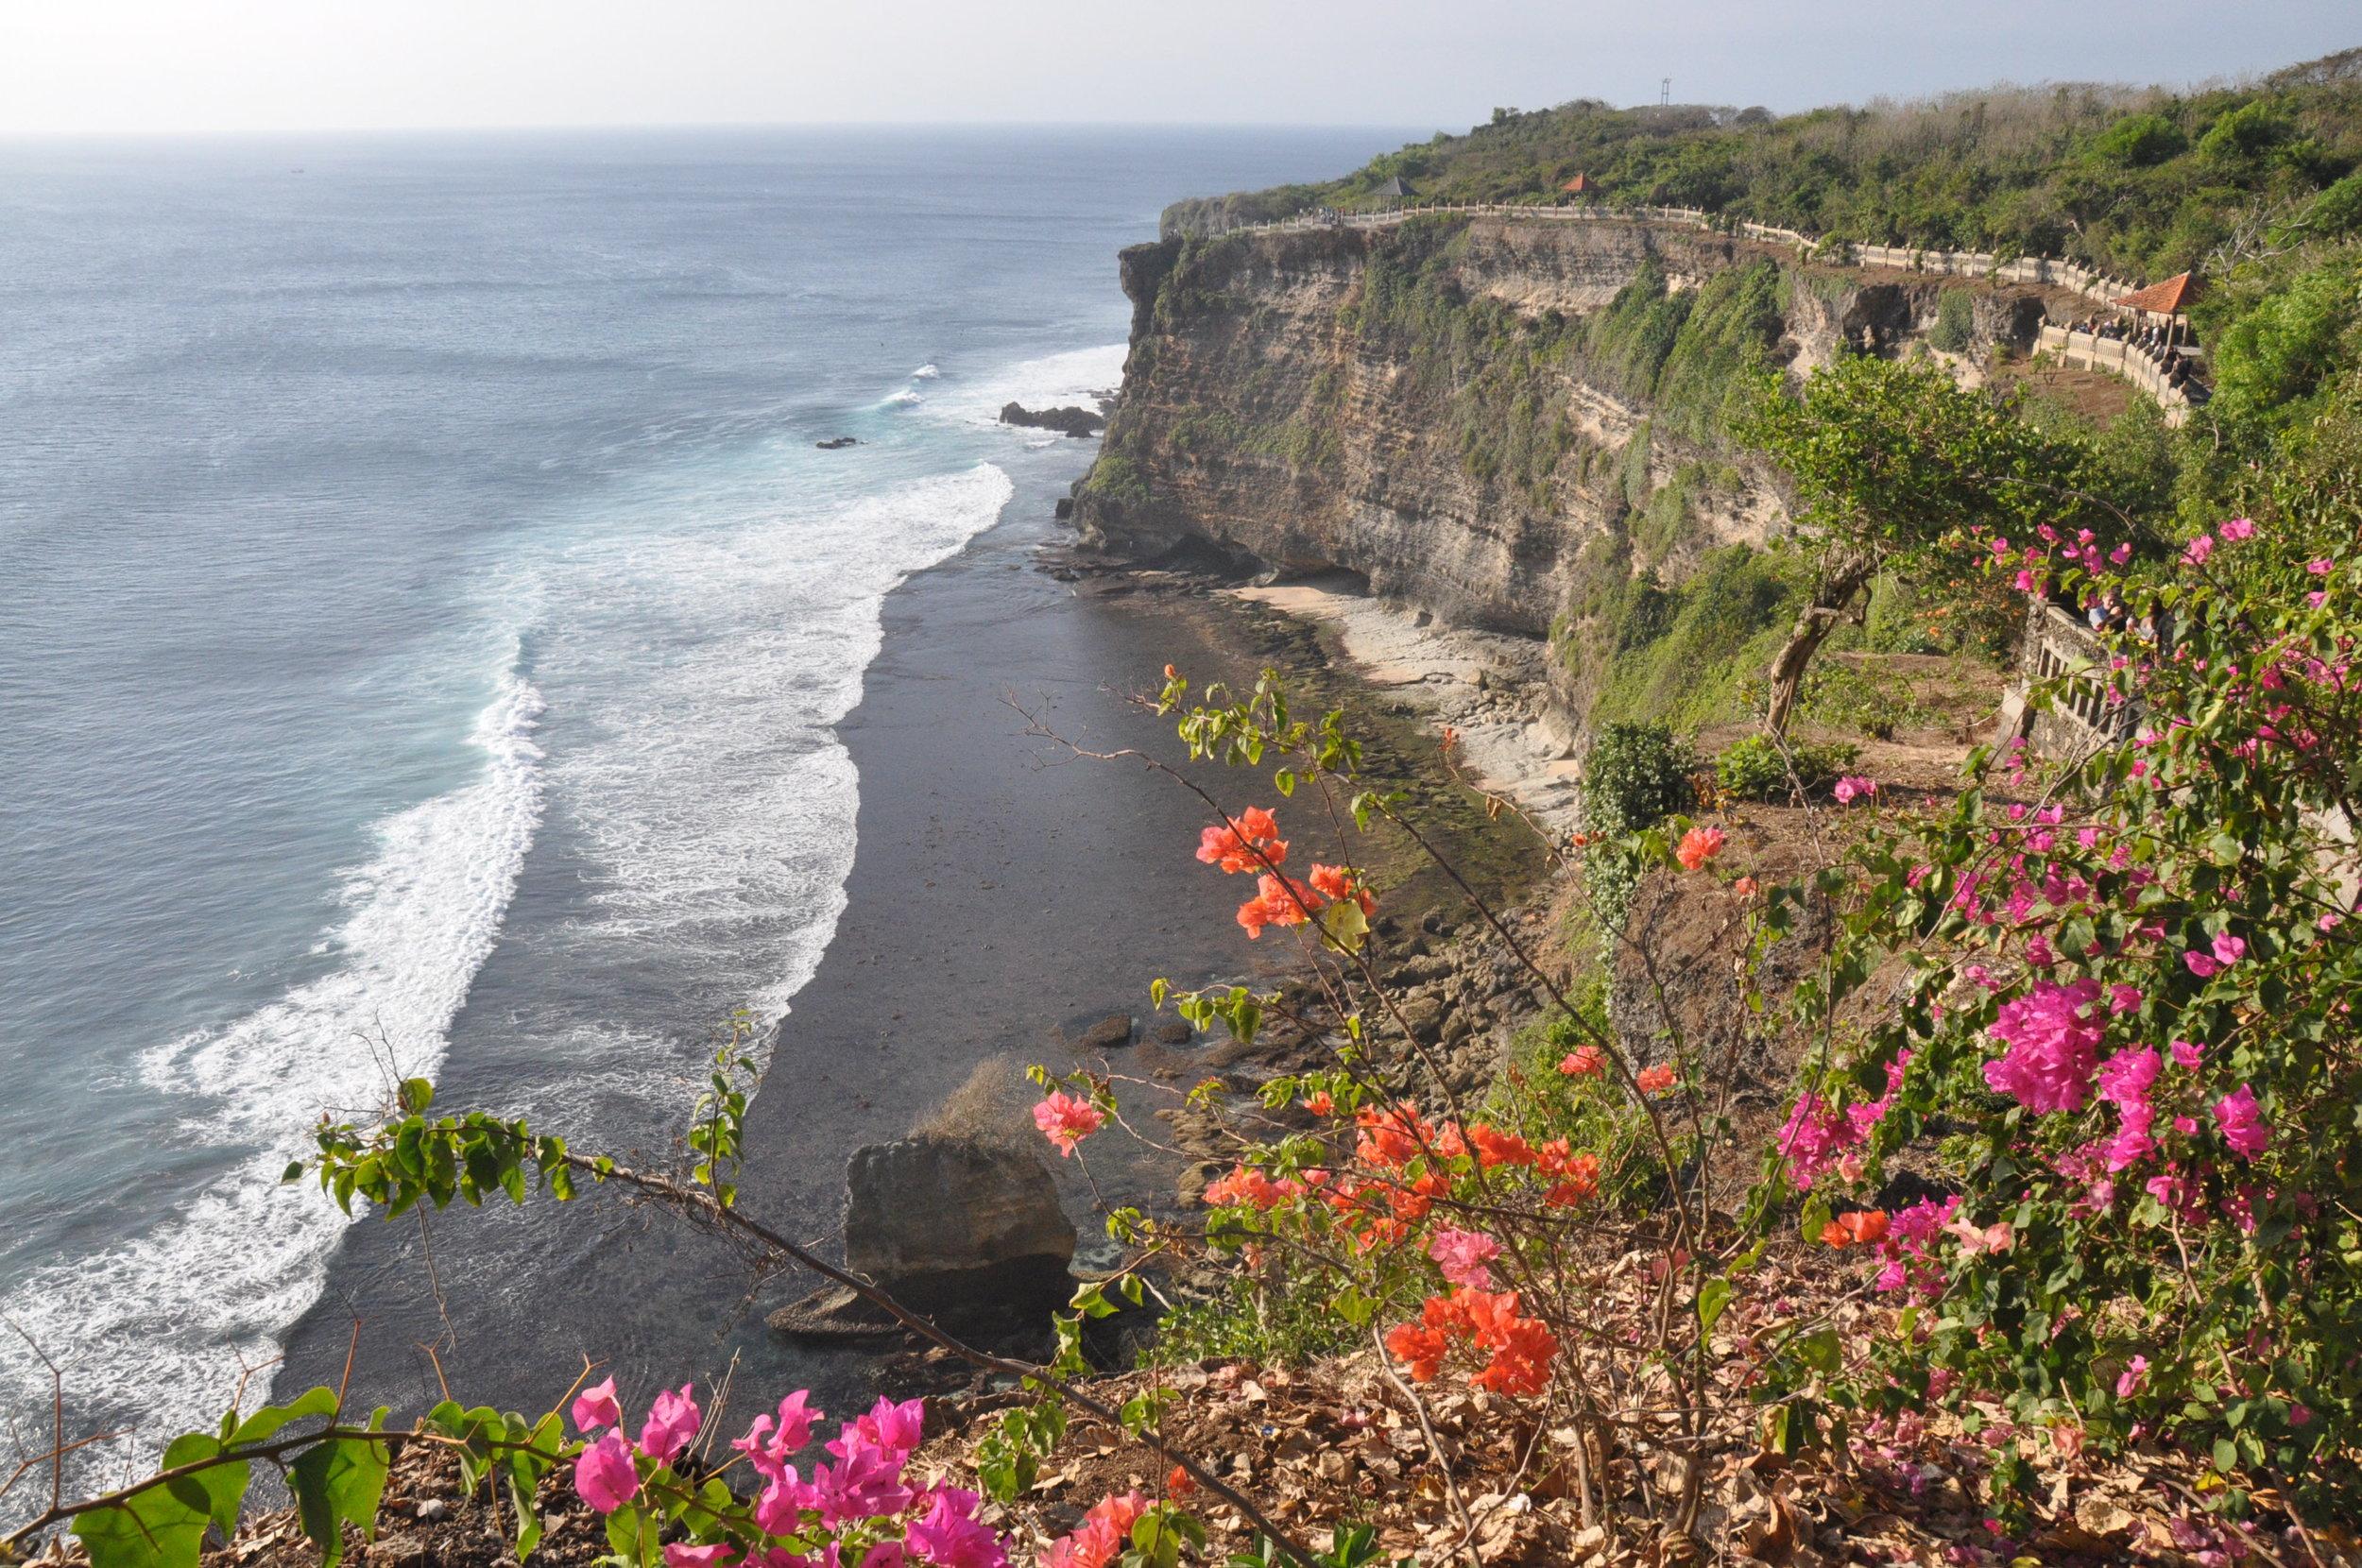 Things to do in Bali Uluwatu